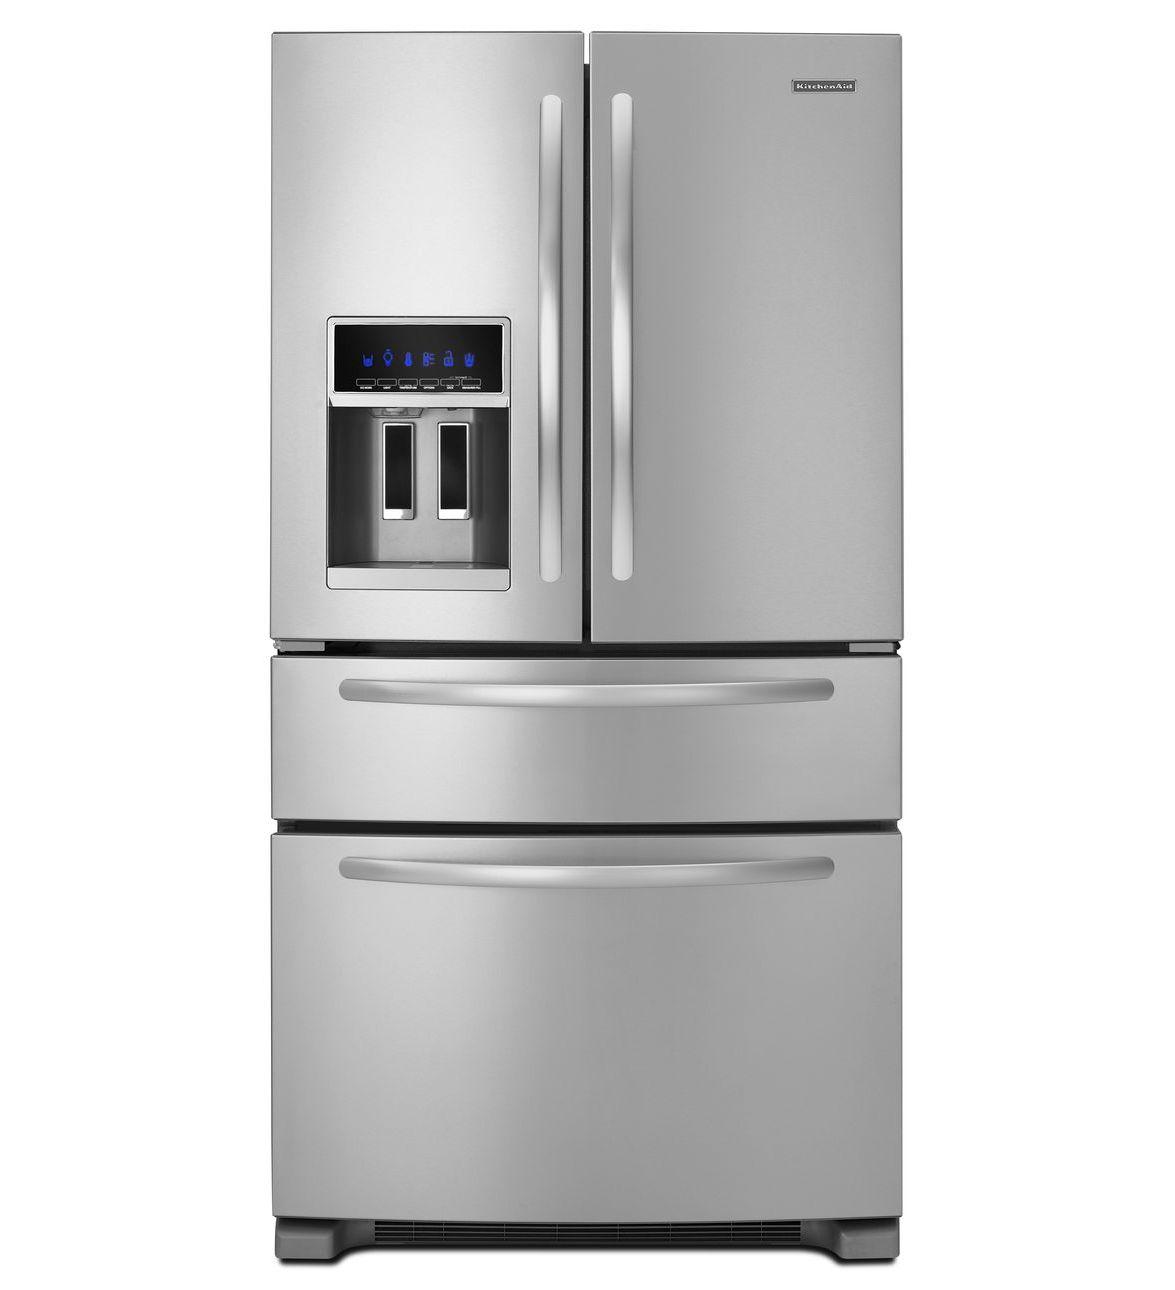 Samsung Fridge Repairs | Fridge0 refrigeration